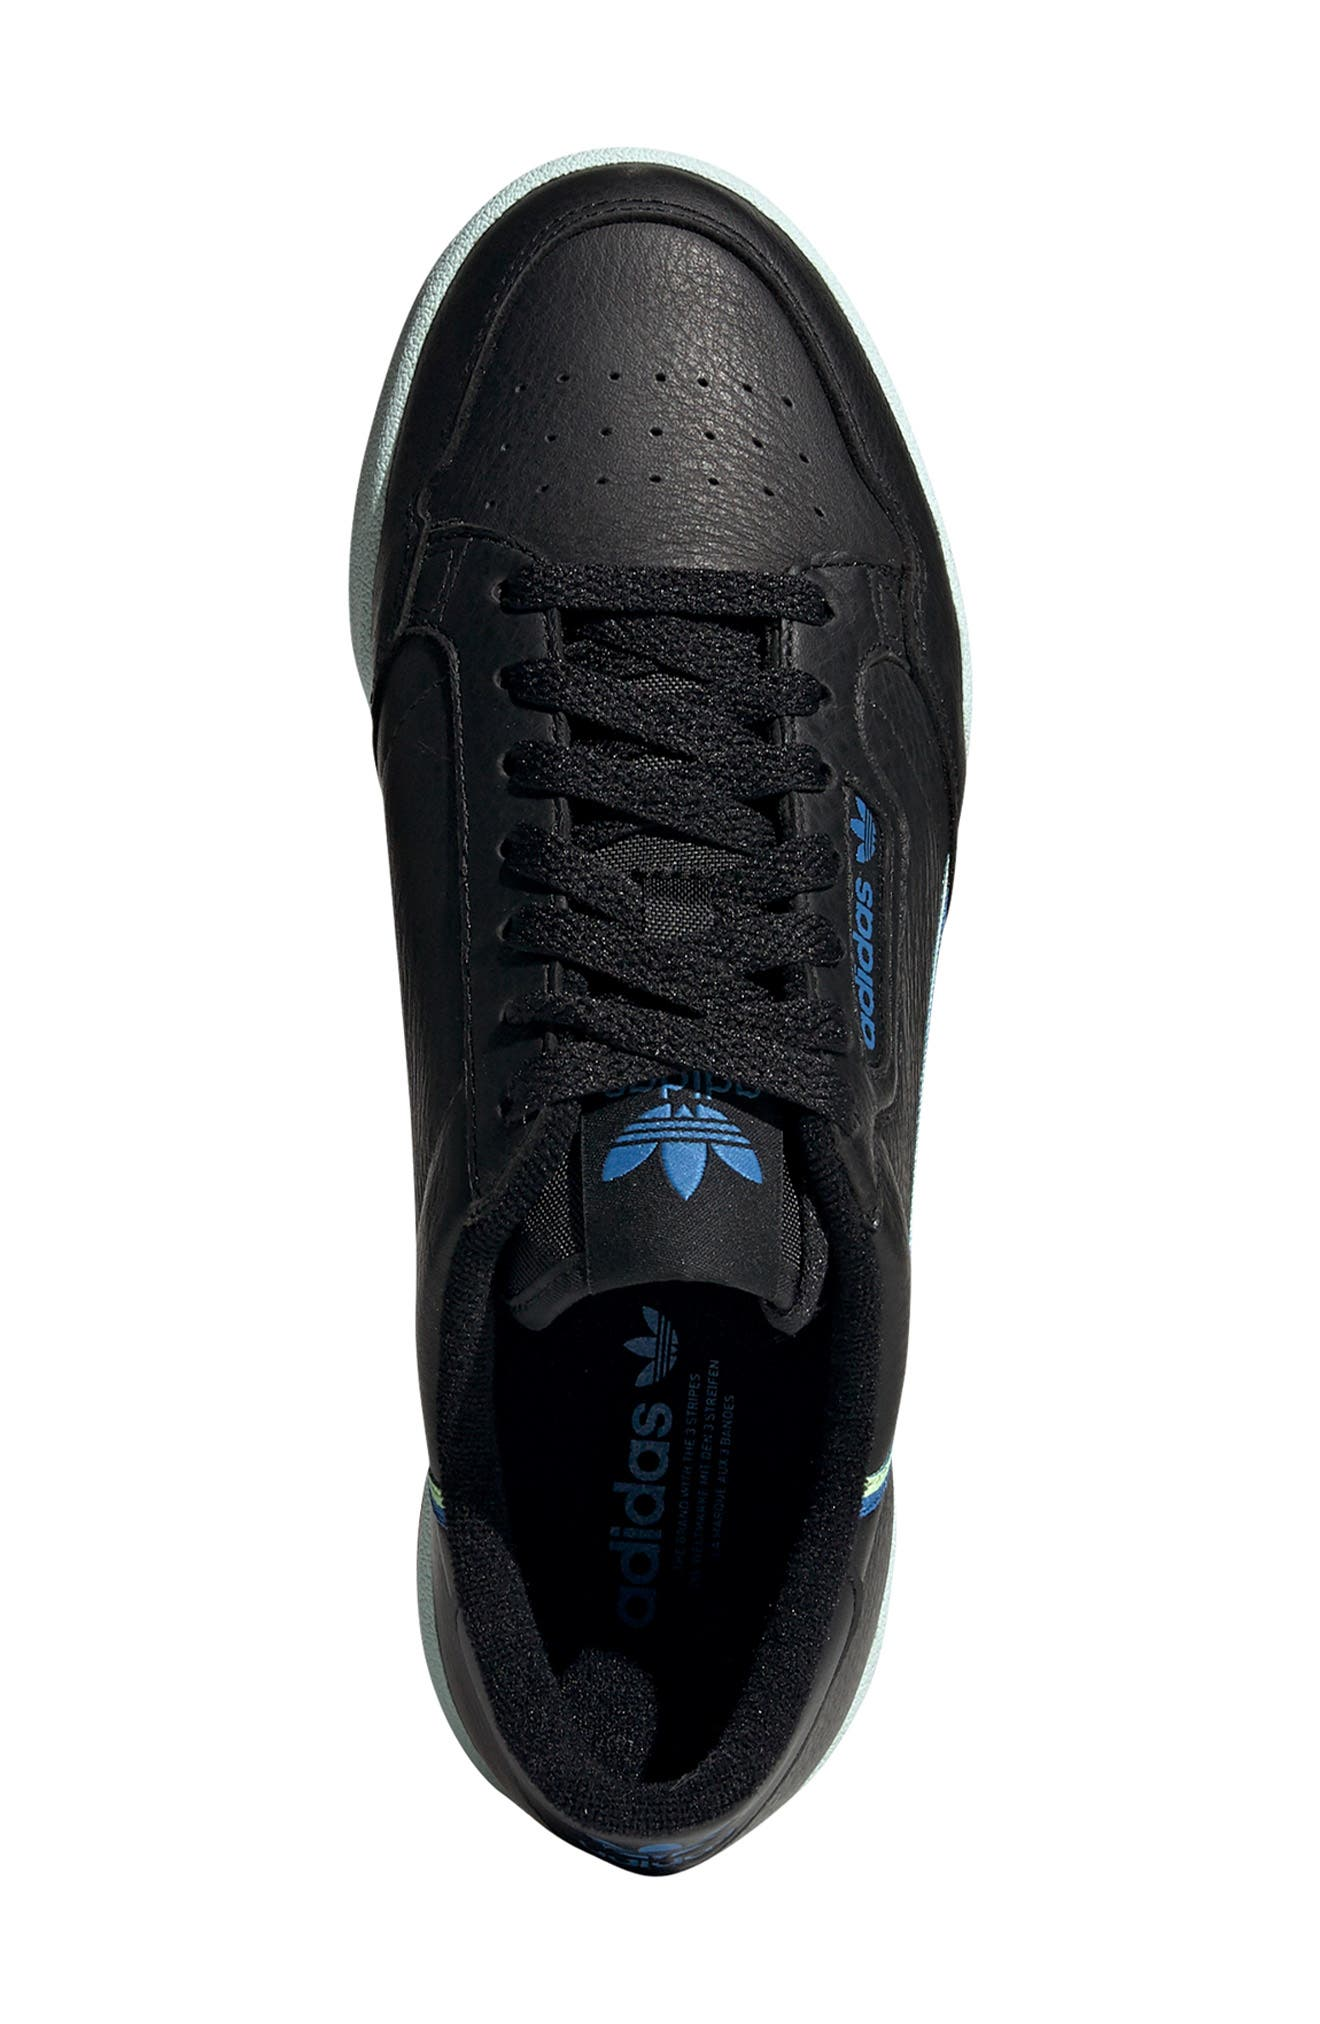 ADIDAS,                             Continental 80 Sneaker,                             Alternate thumbnail 4, color,                             BLACK/ HI-RES YELLOW/ BLUE